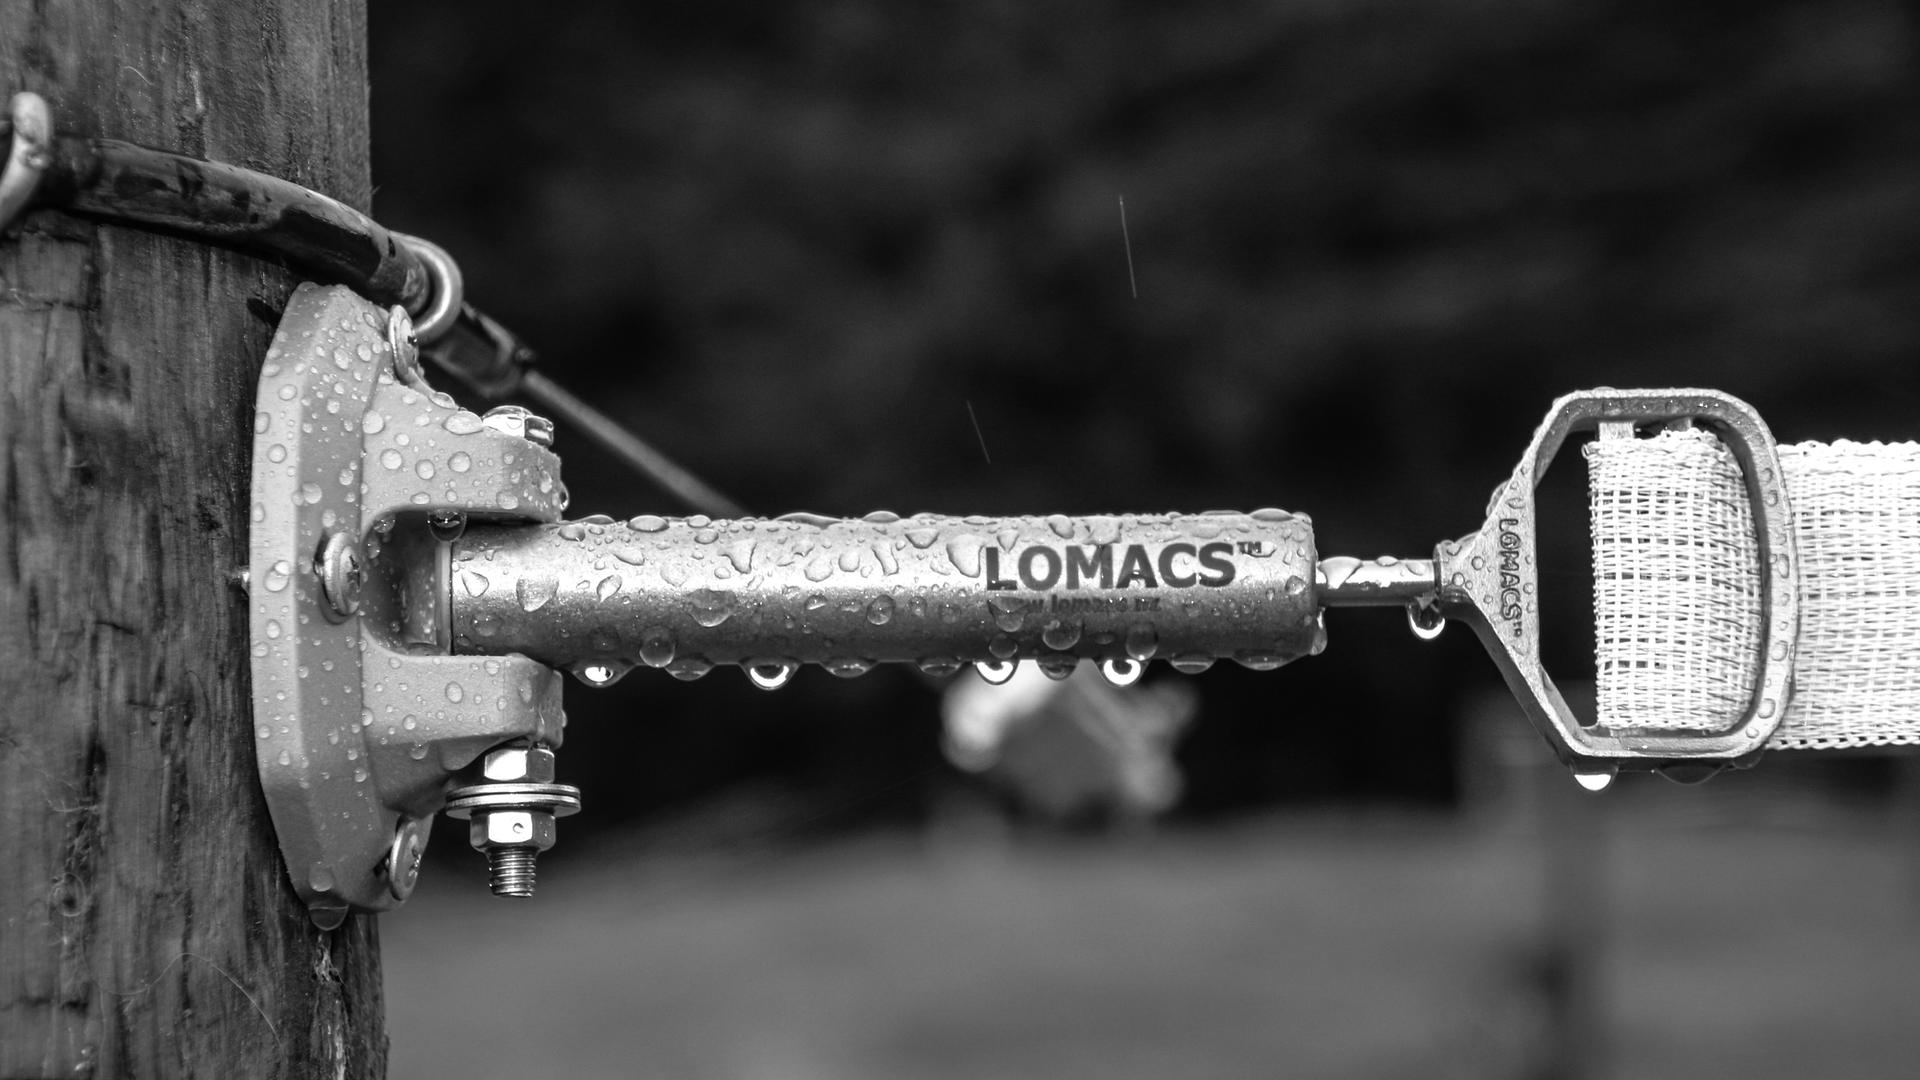 Lomacs